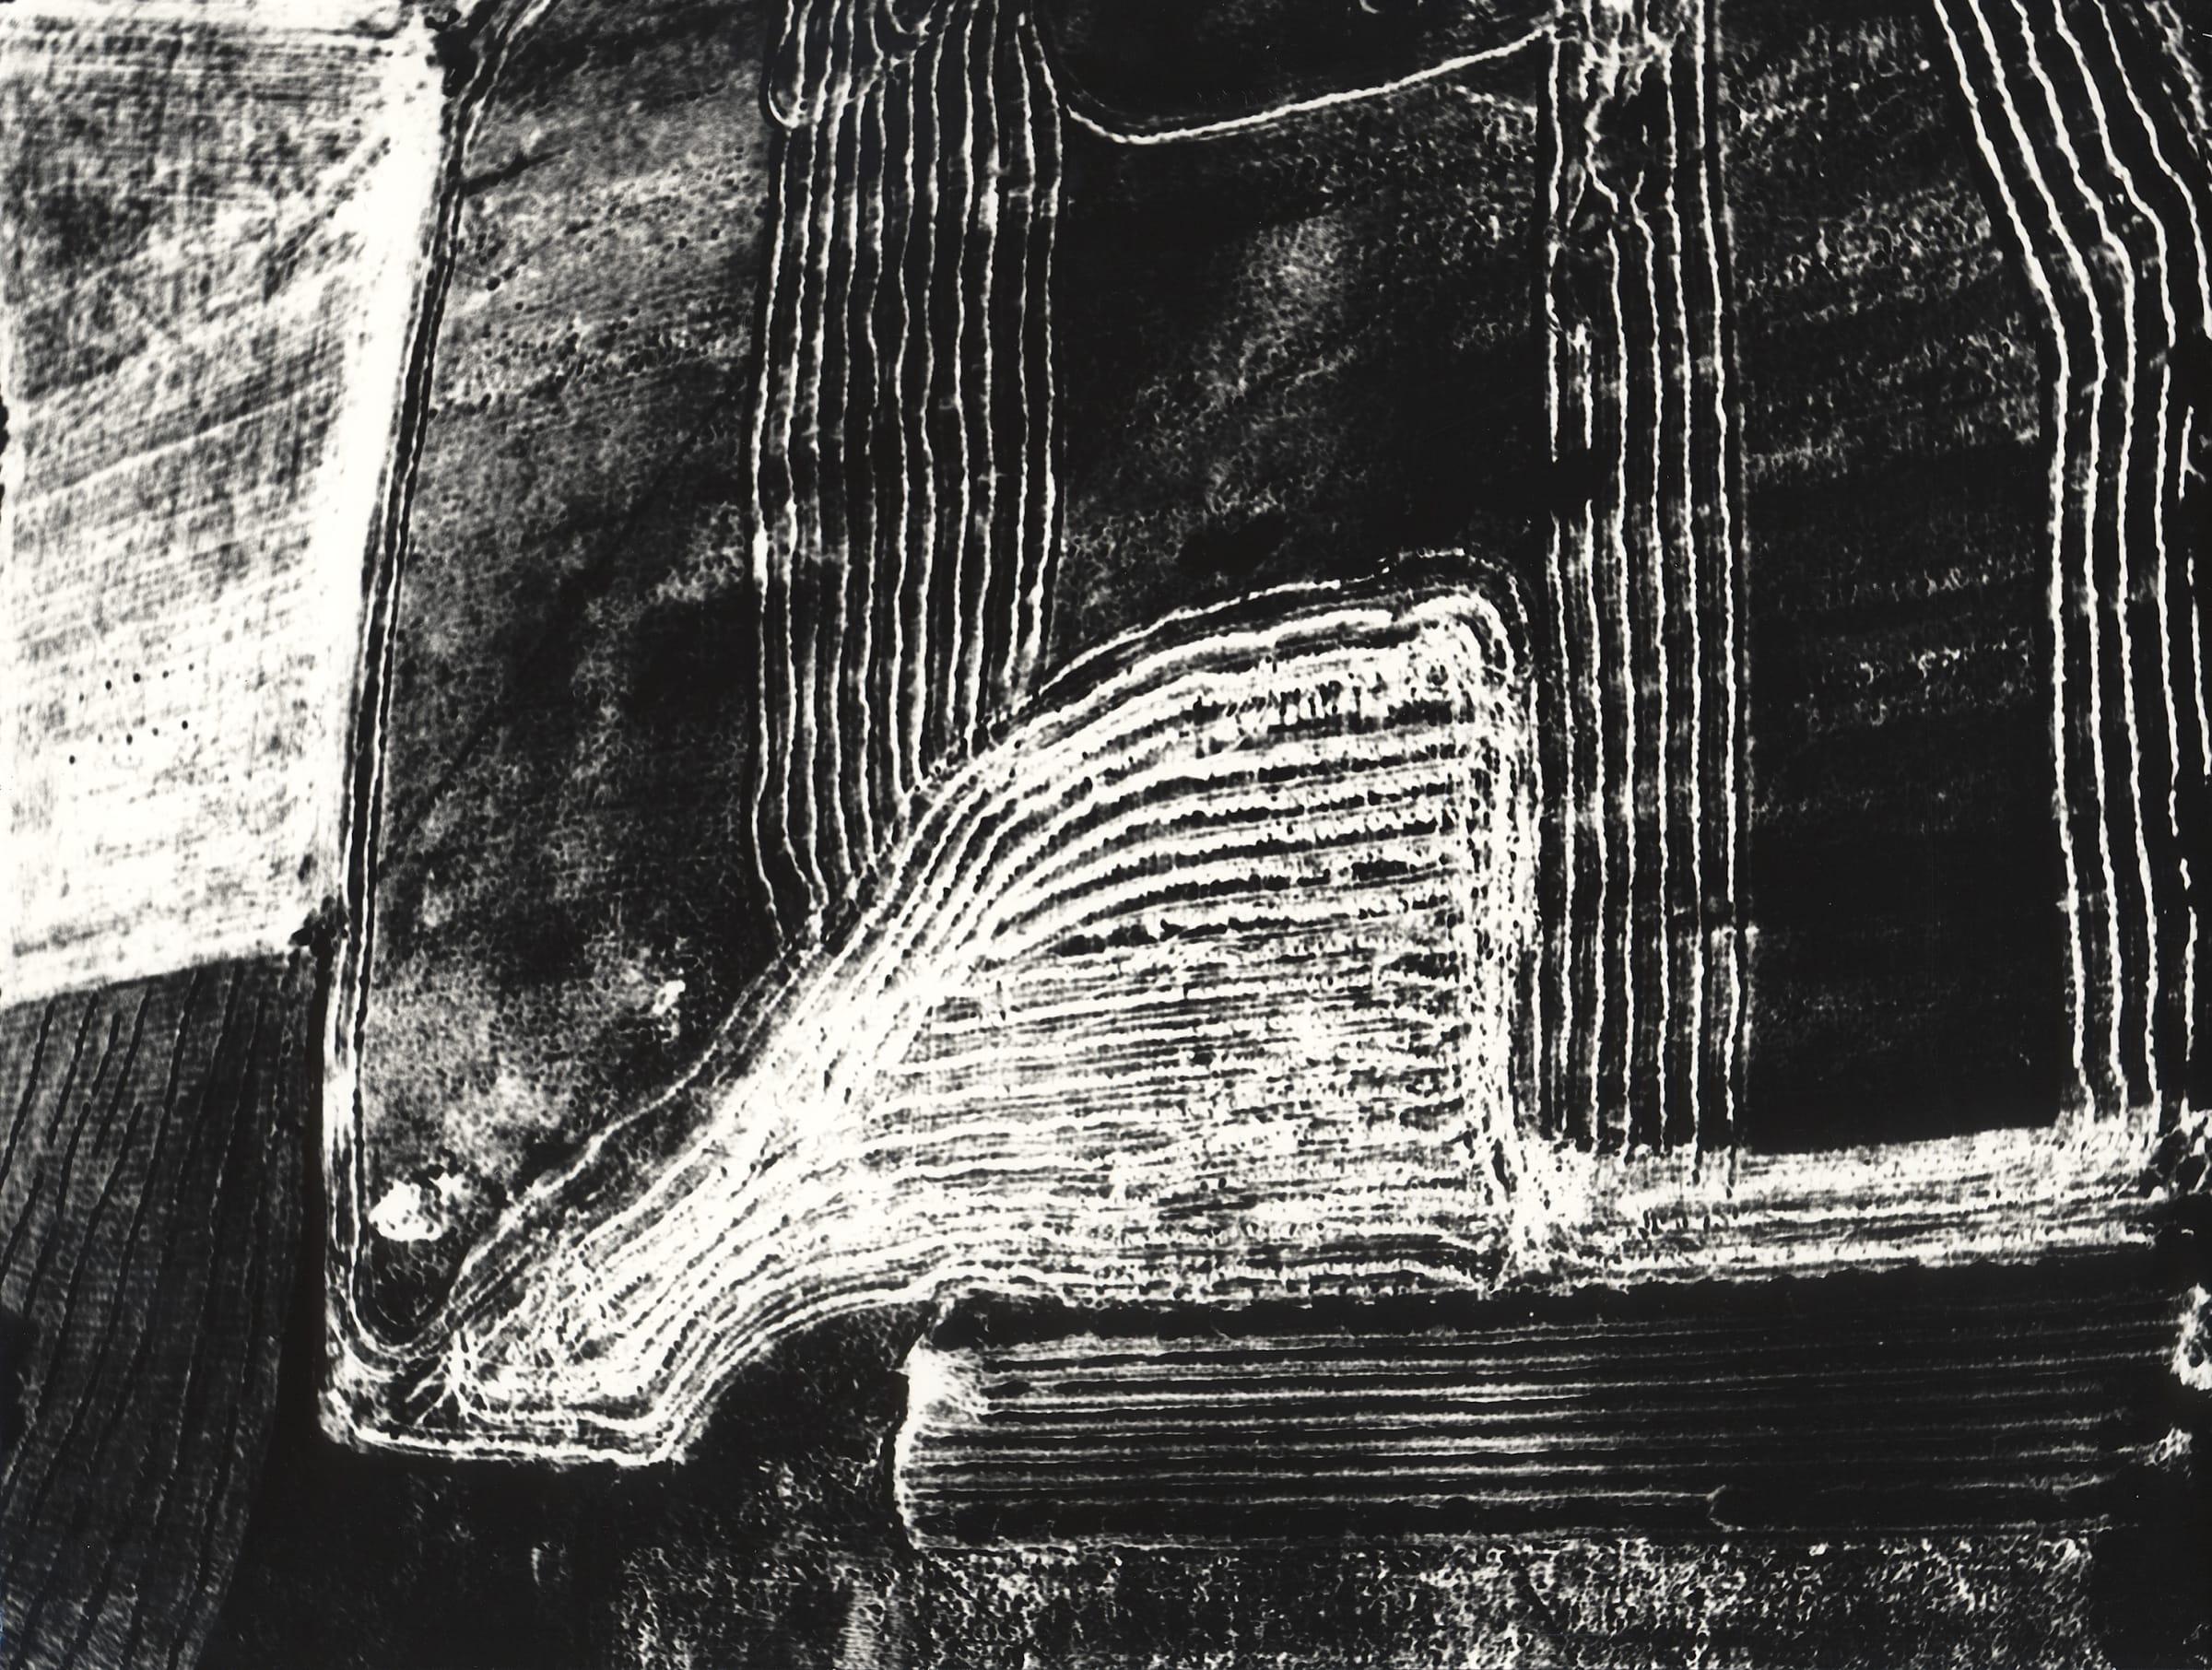 "<span class=""link fancybox-details-link""><a href=""/content/feature/297/artworks1169/"">View Detail Page</a></span><div class=""medium"">Vintage silver gelatin print</div> <div class=""dimensions"">30.2 x 40.3 cm<br /> 11 7/8 x 15 7/8 in</div>"